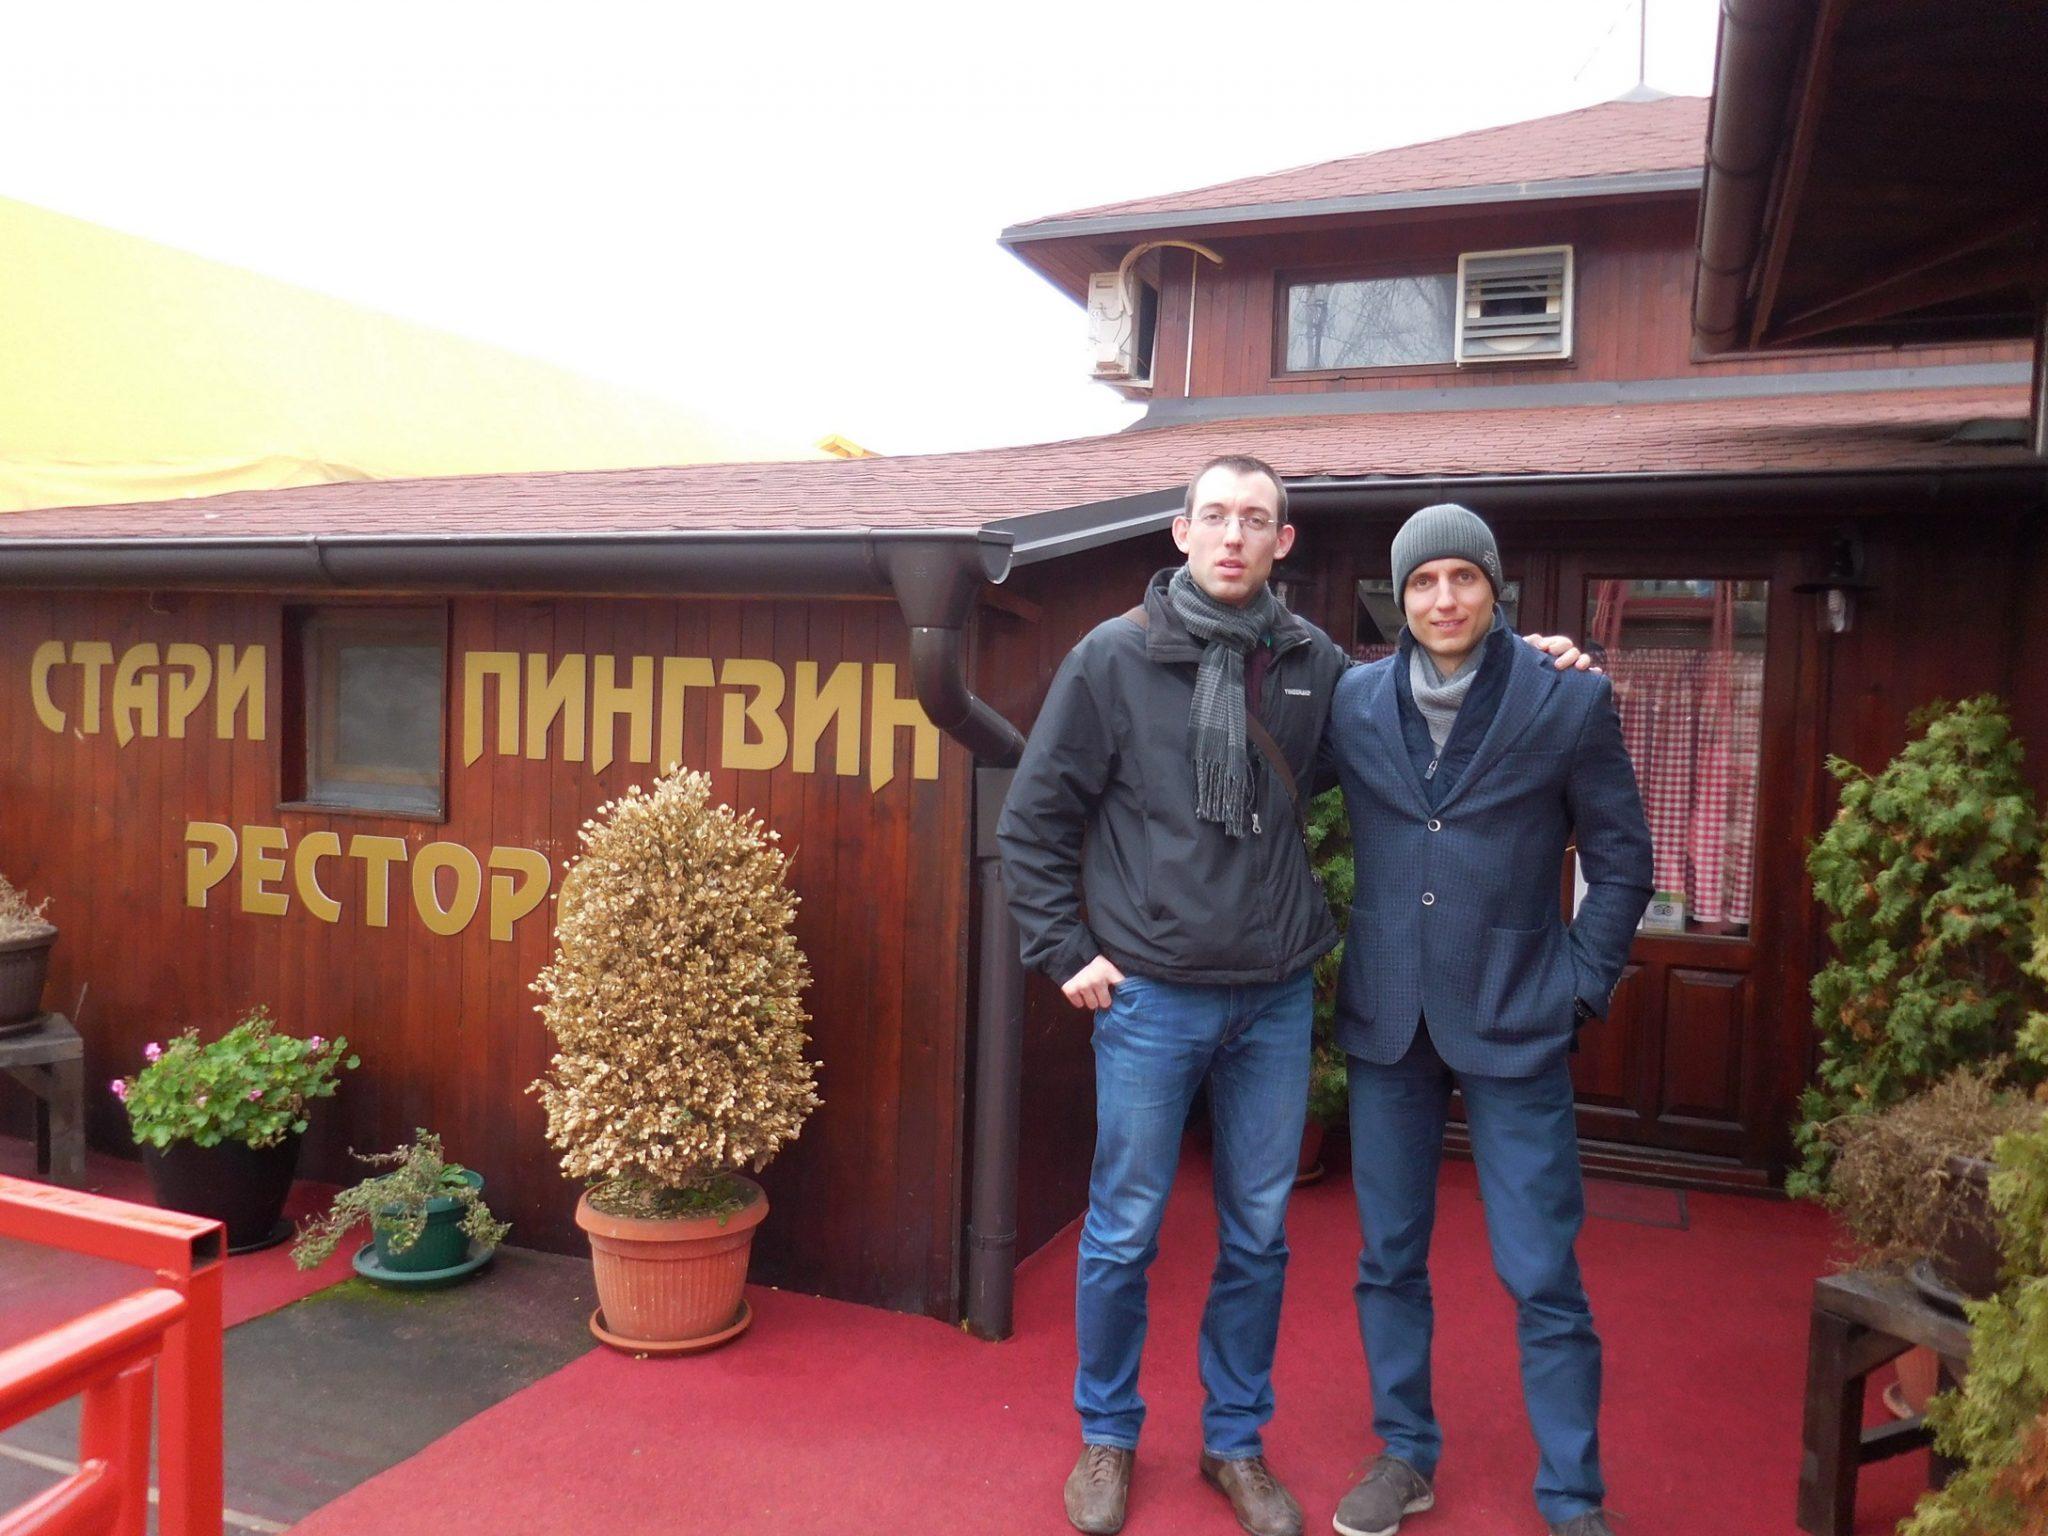 Belgrade, Stari Pingvin Restaurant, Aleksandar and Svetoslav, Serbia